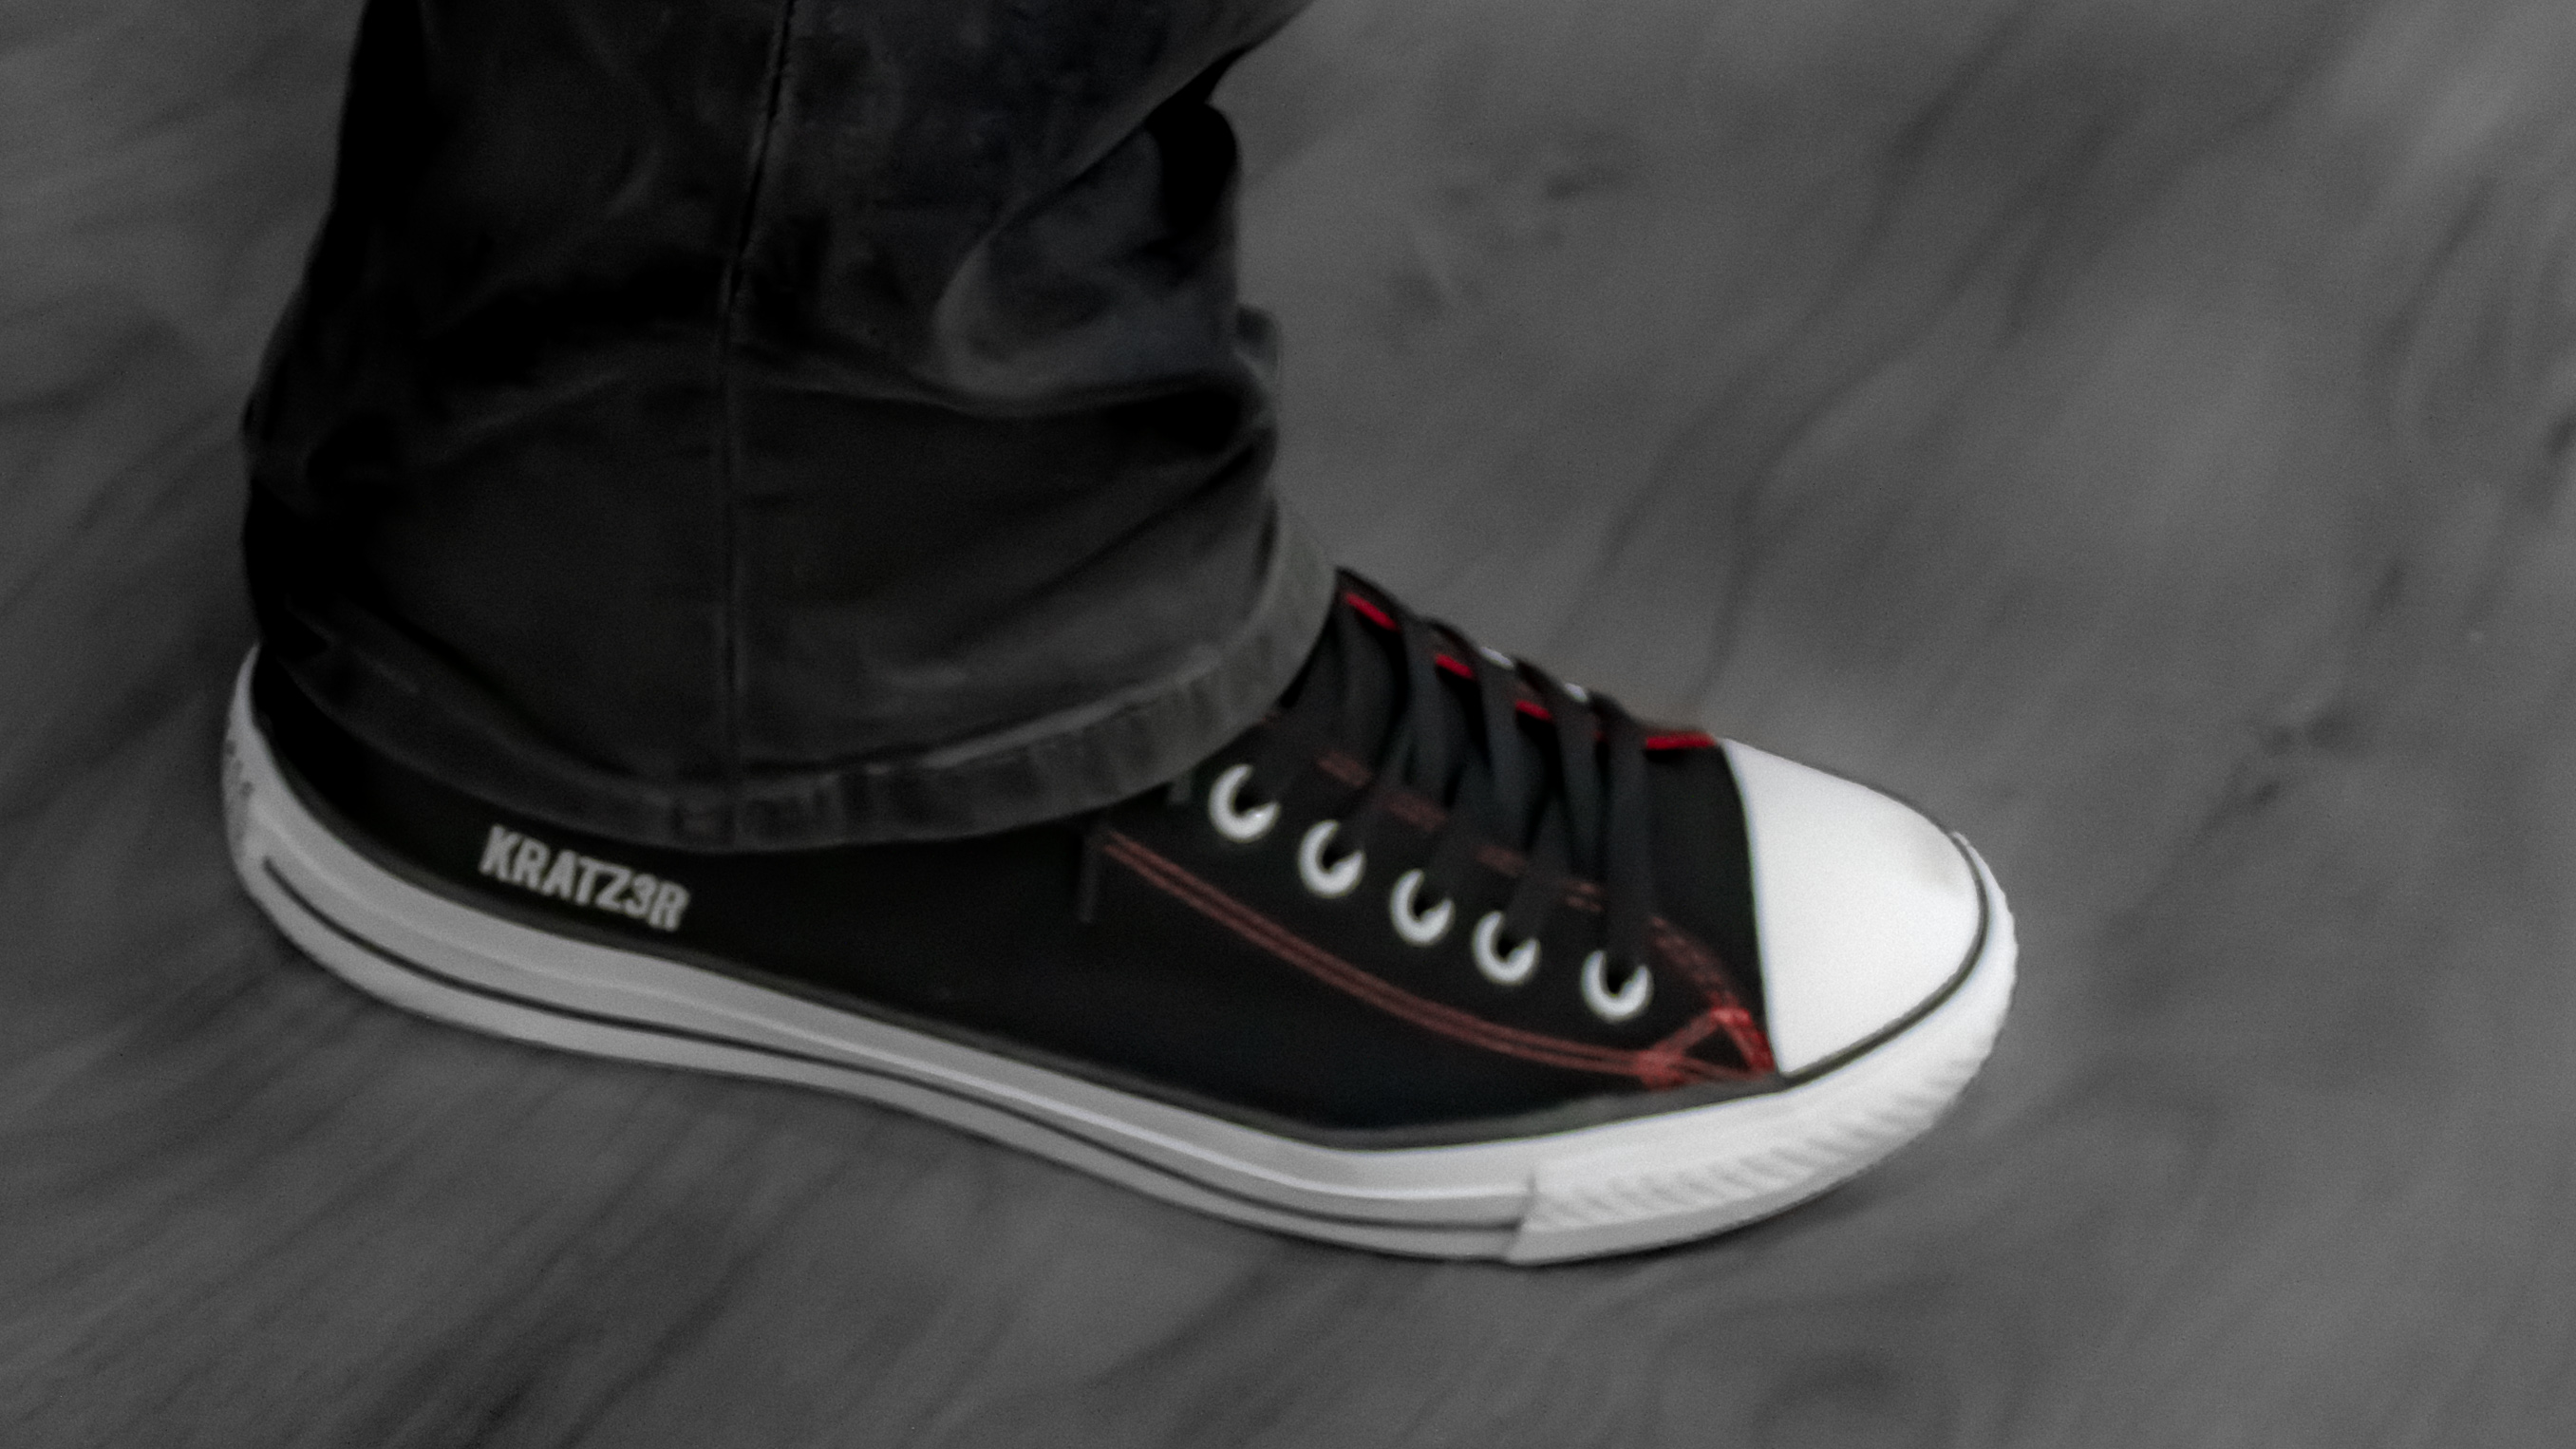 KRATZ3R branded Chucks